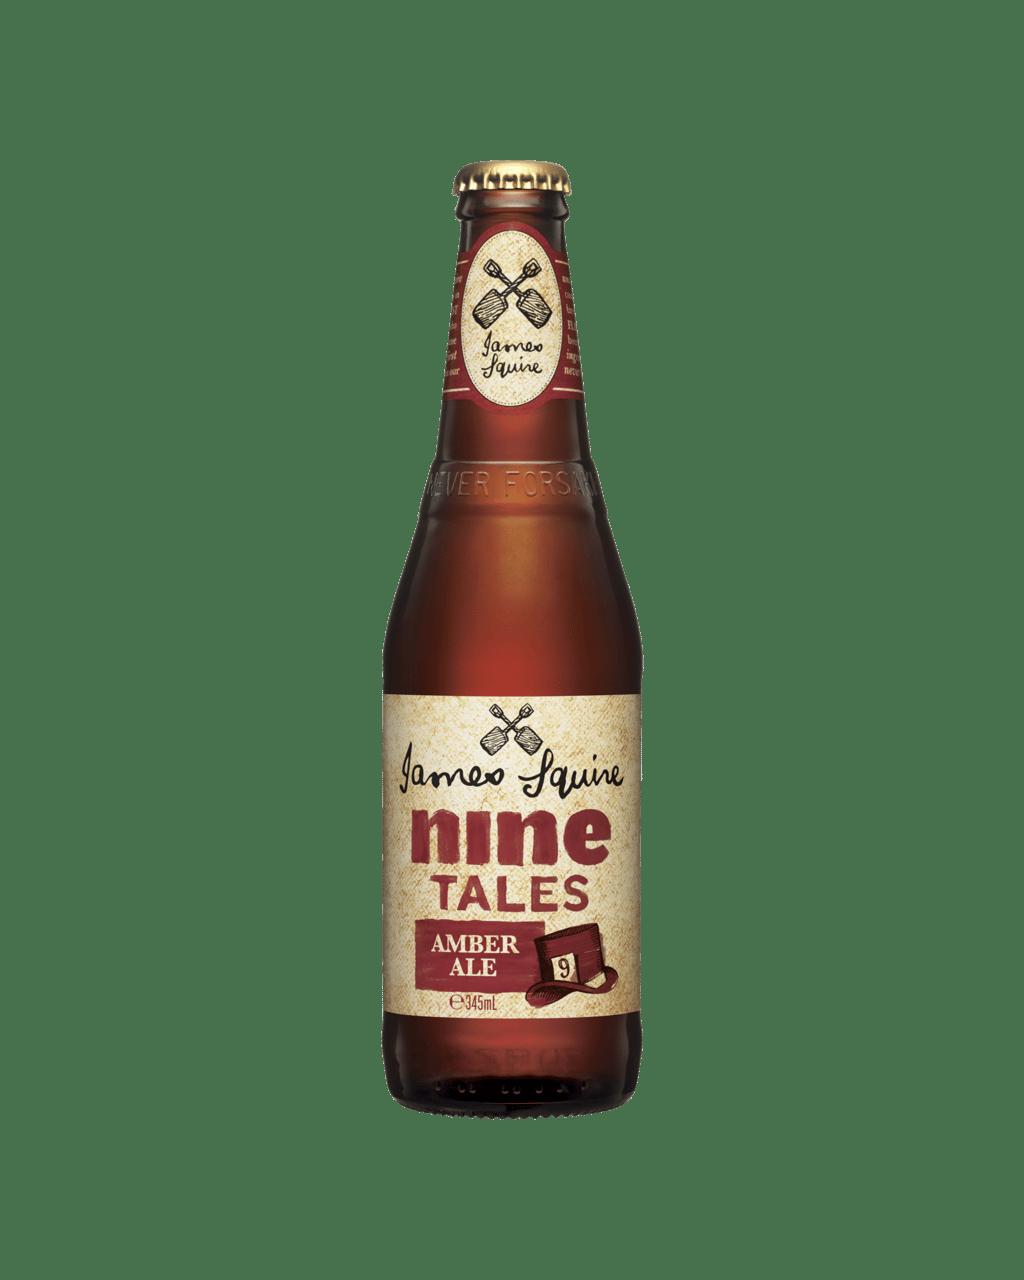 james squire nine tales amber ale 345ml dan murphy s buy wine